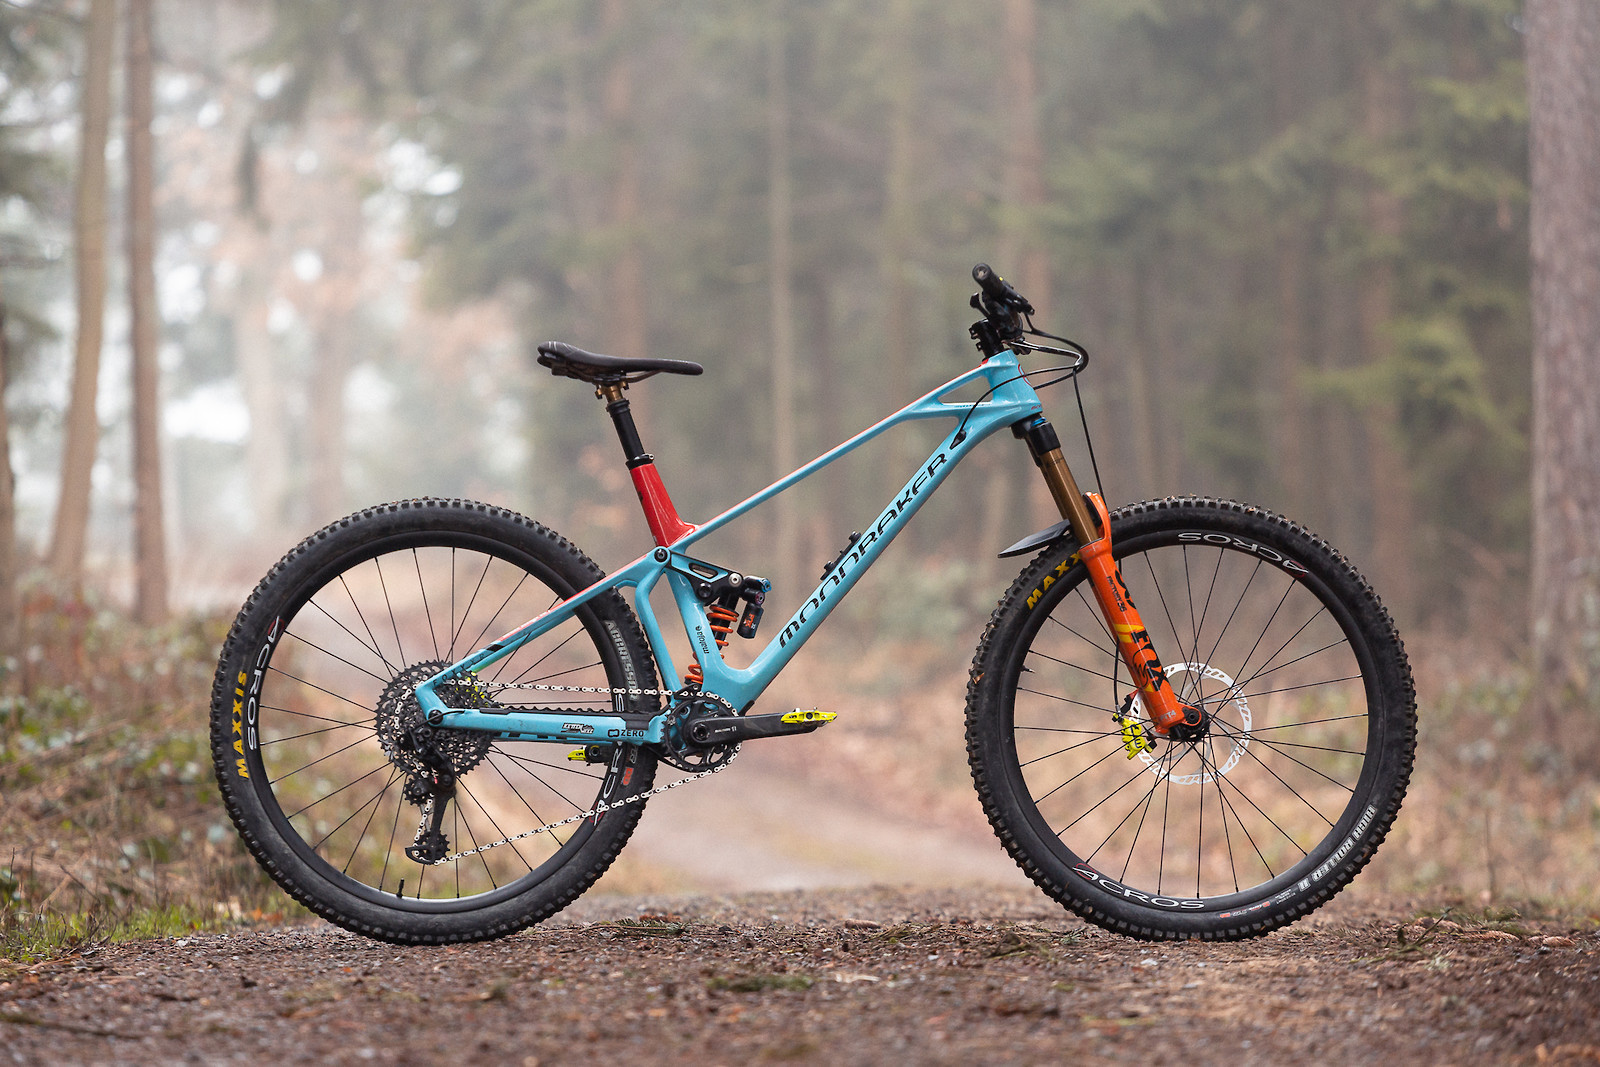 Mondraker Foxy 29 XR - 2019 Vital Bike of the Day Collection - Mountain Biking Pictures - Vital MTB